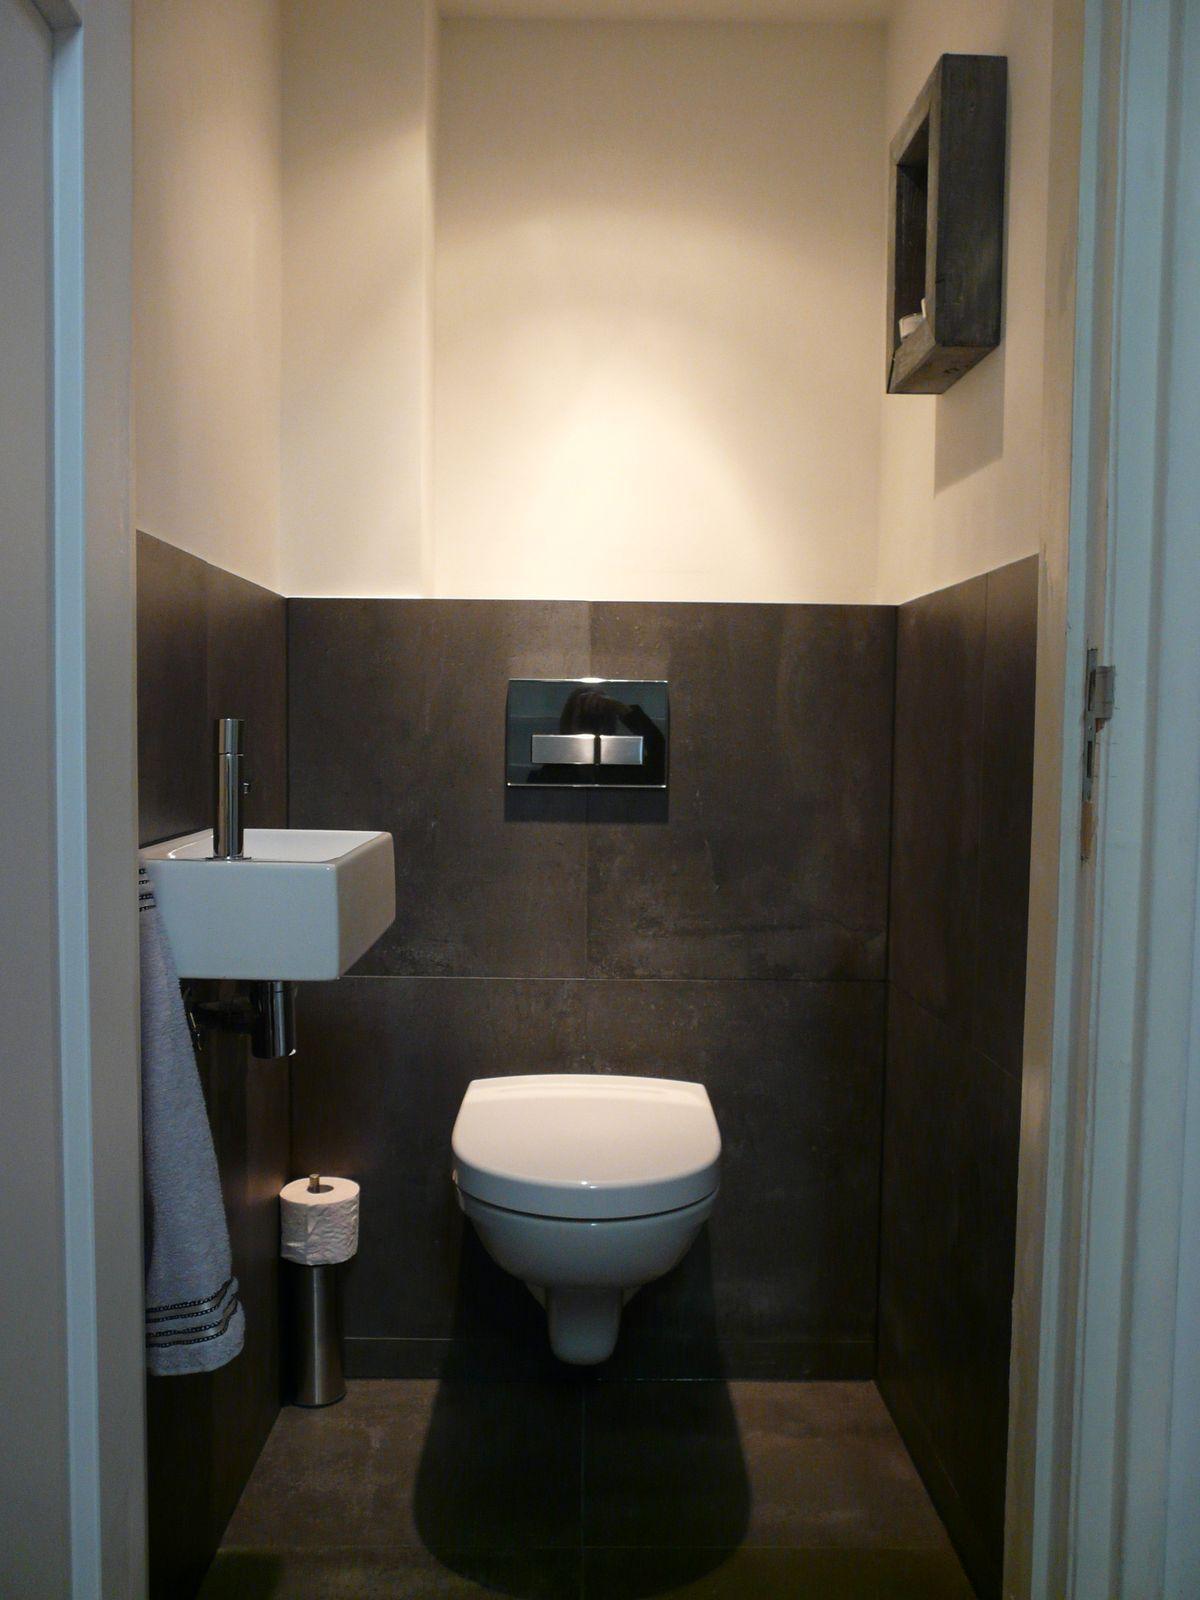 Badkamer idee modern - Tegels wc design ...